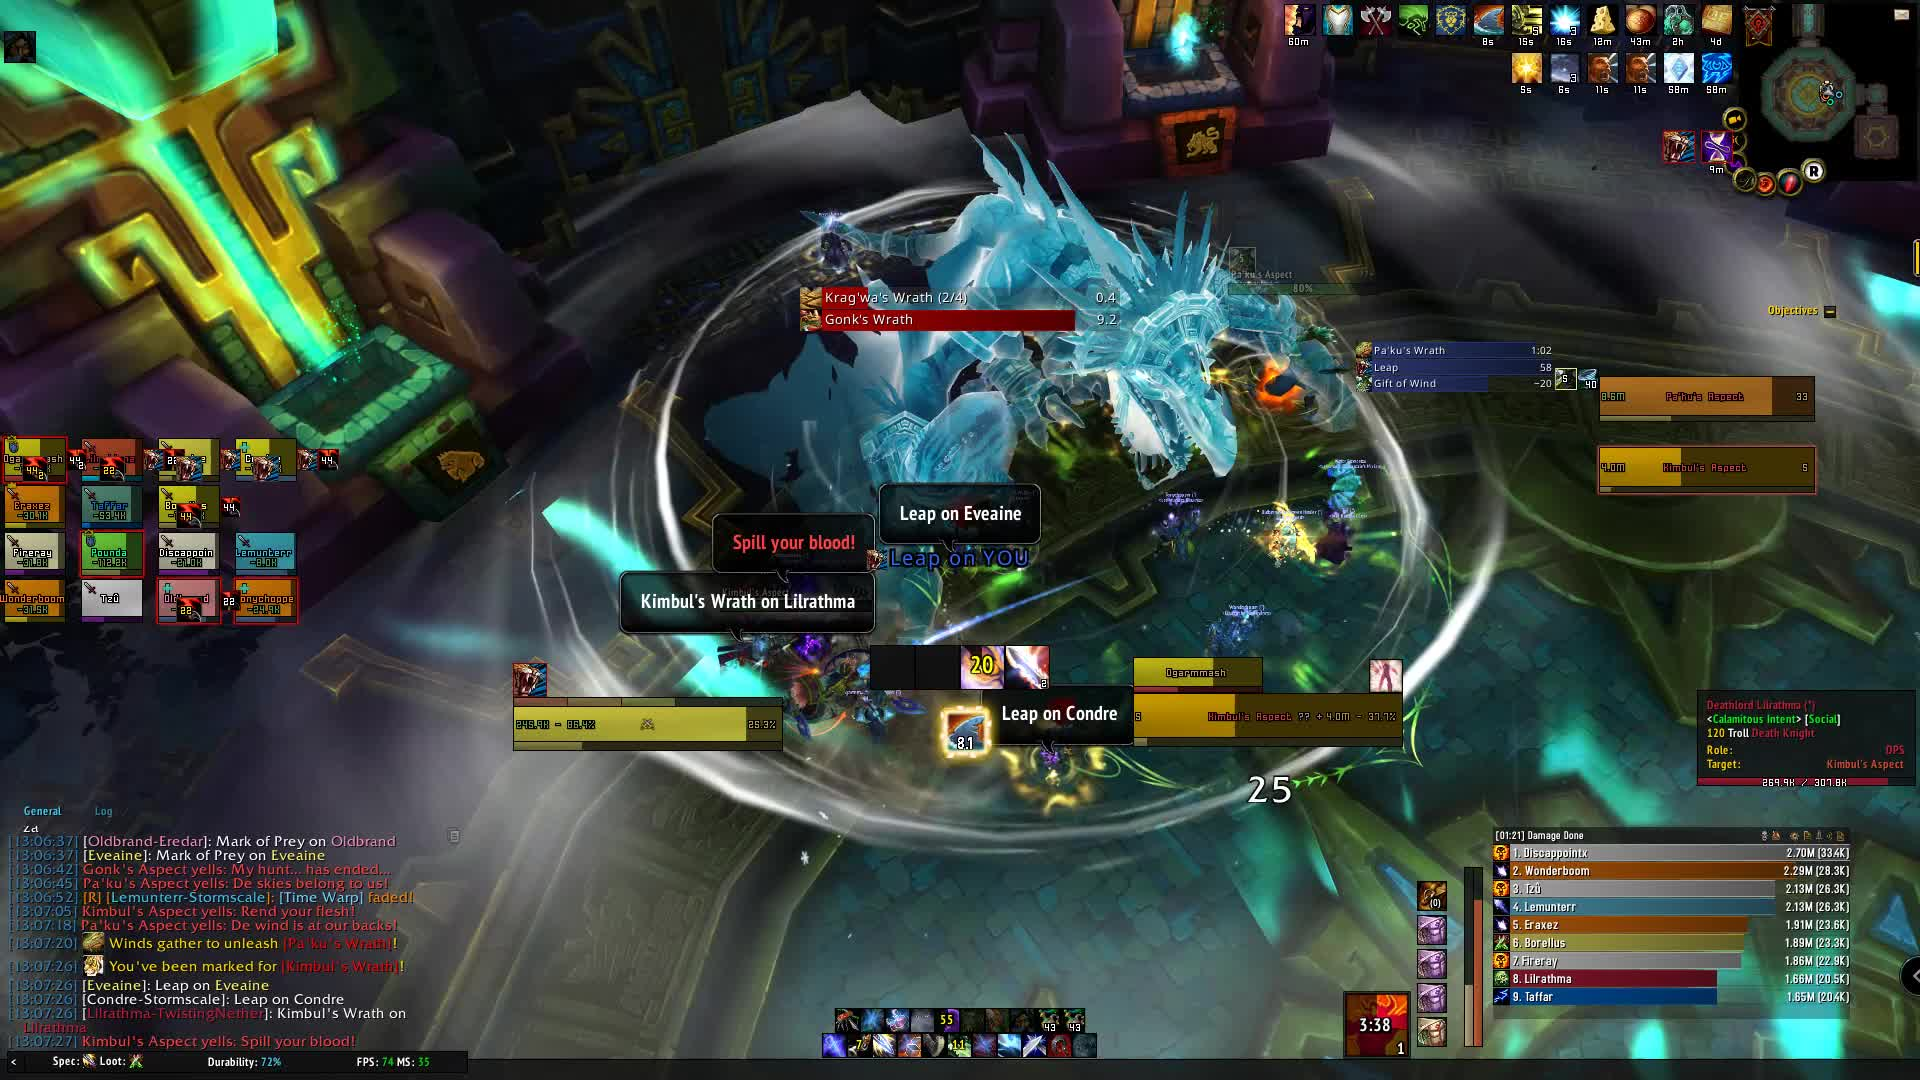 worldofwarcraft, vlc-record-2019-04-17-13h15m05s-World Of Warcraft 2019.04.17 - 13.10.27.03.DVR.mp4- GIFs